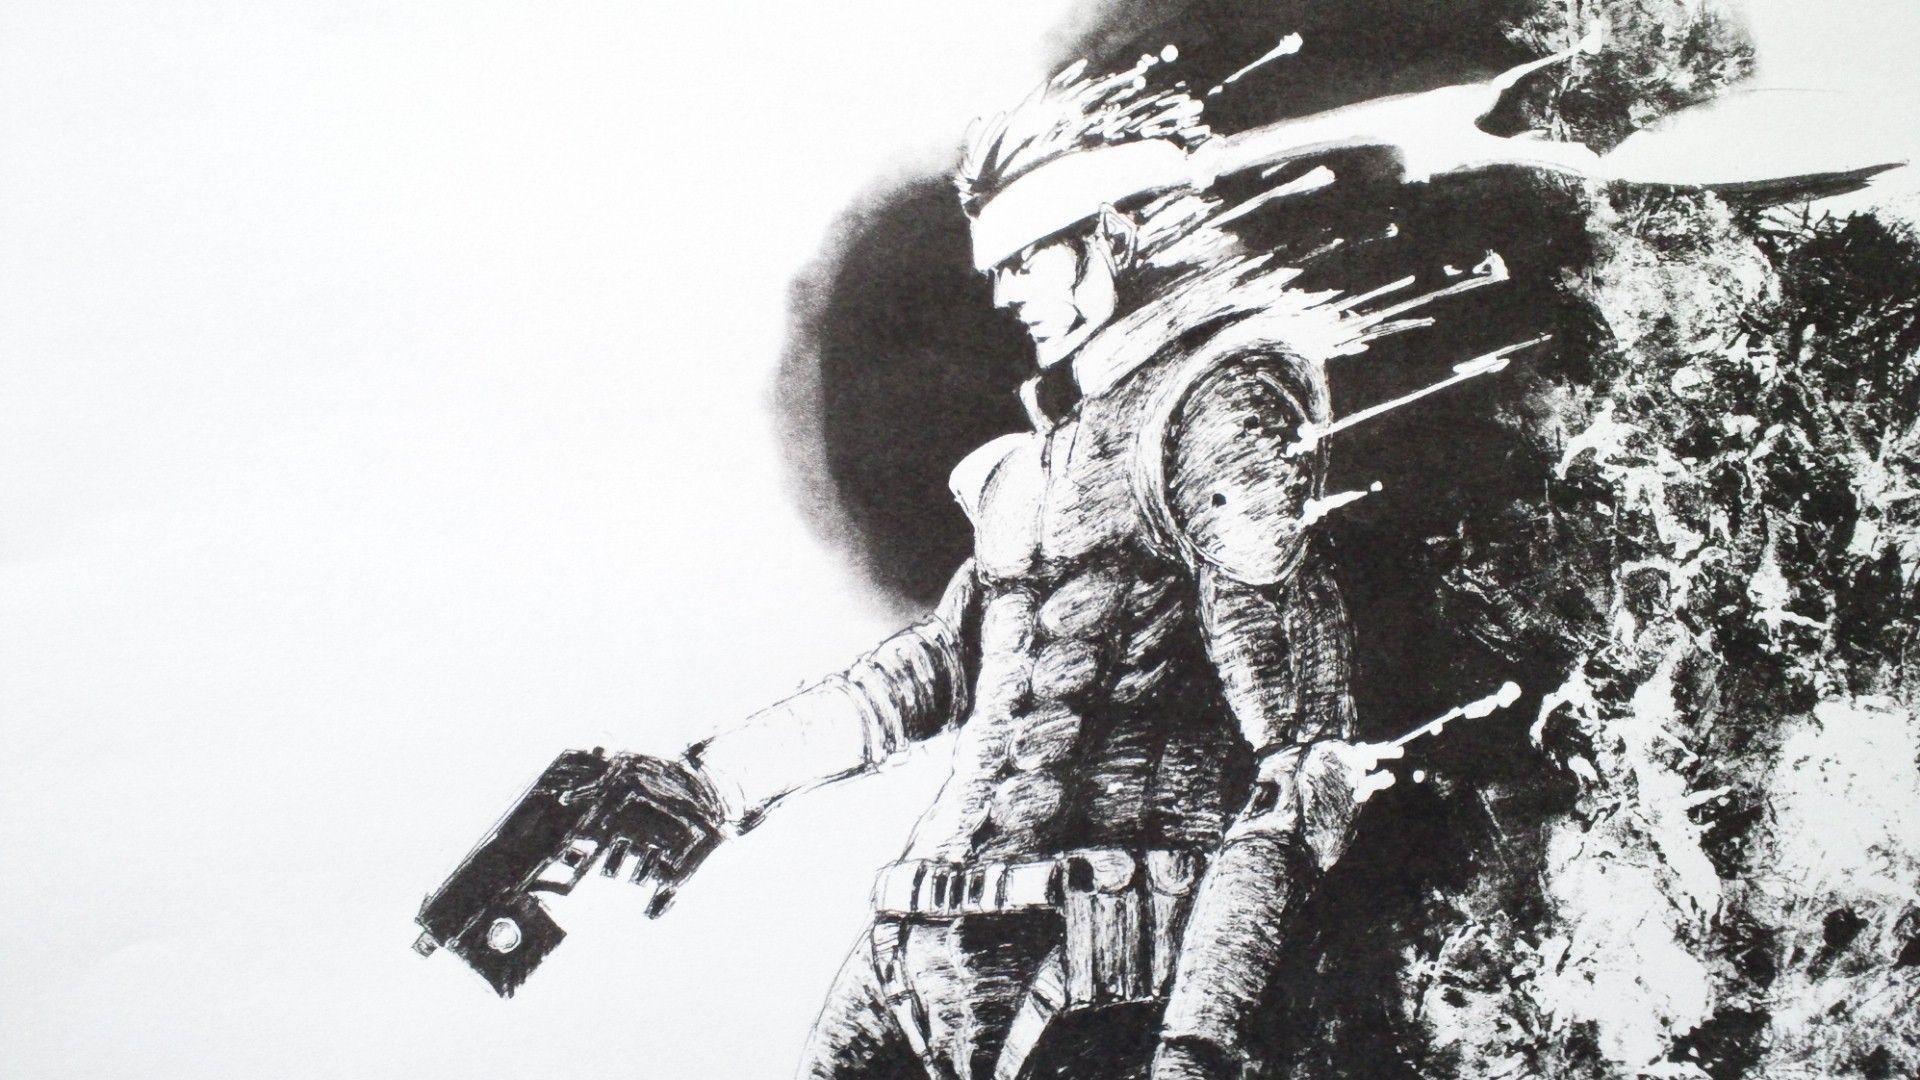 Metal Gear Solid Wallpapers Top Free Metal Gear Solid